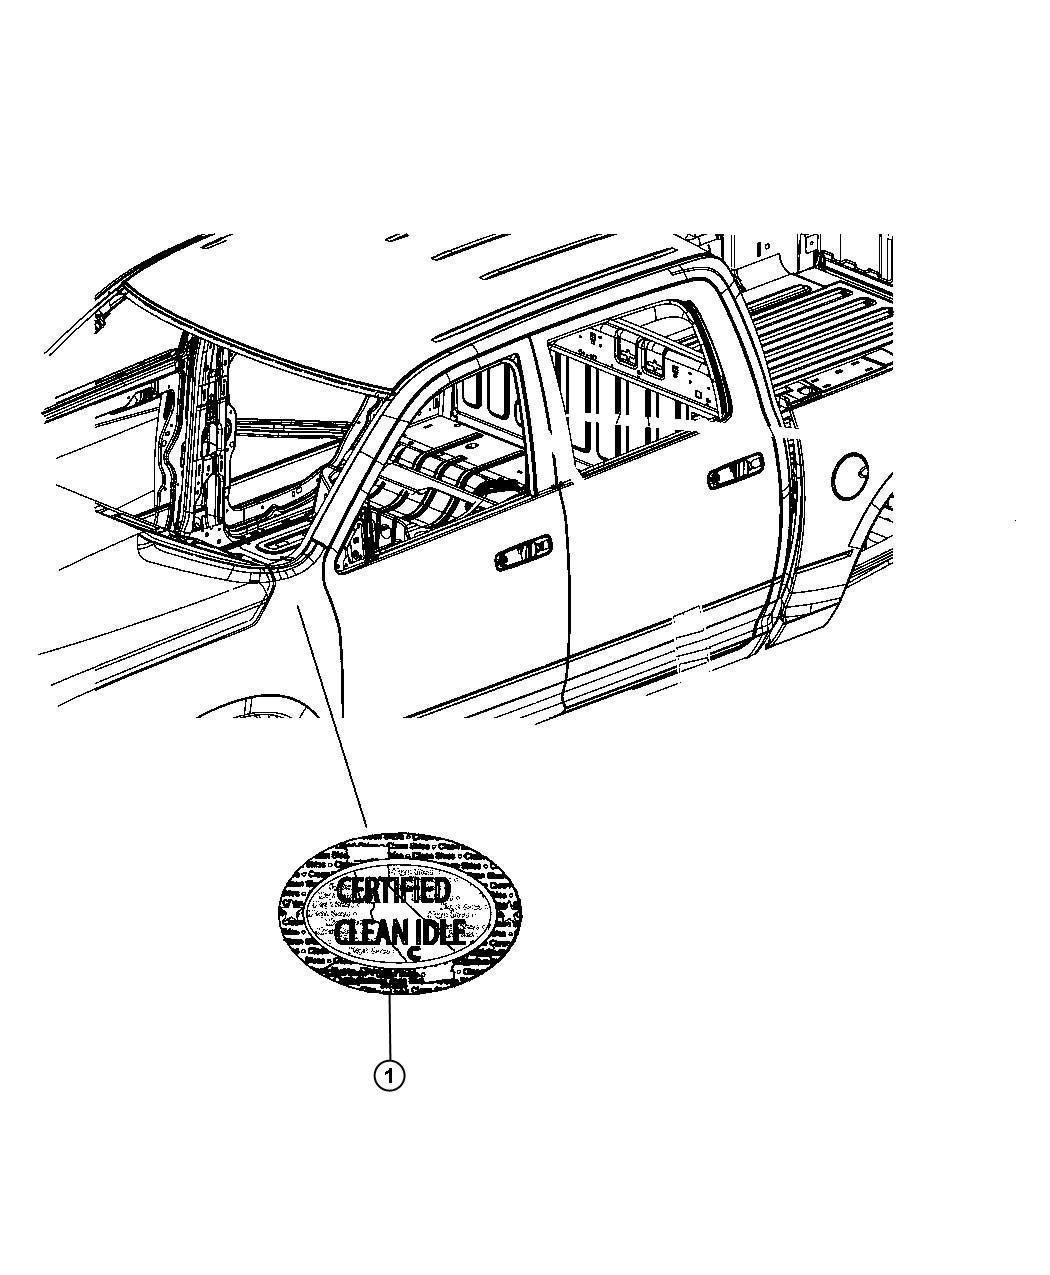 Dodge Ram Label Clean Idle Emissions 3 7l V6